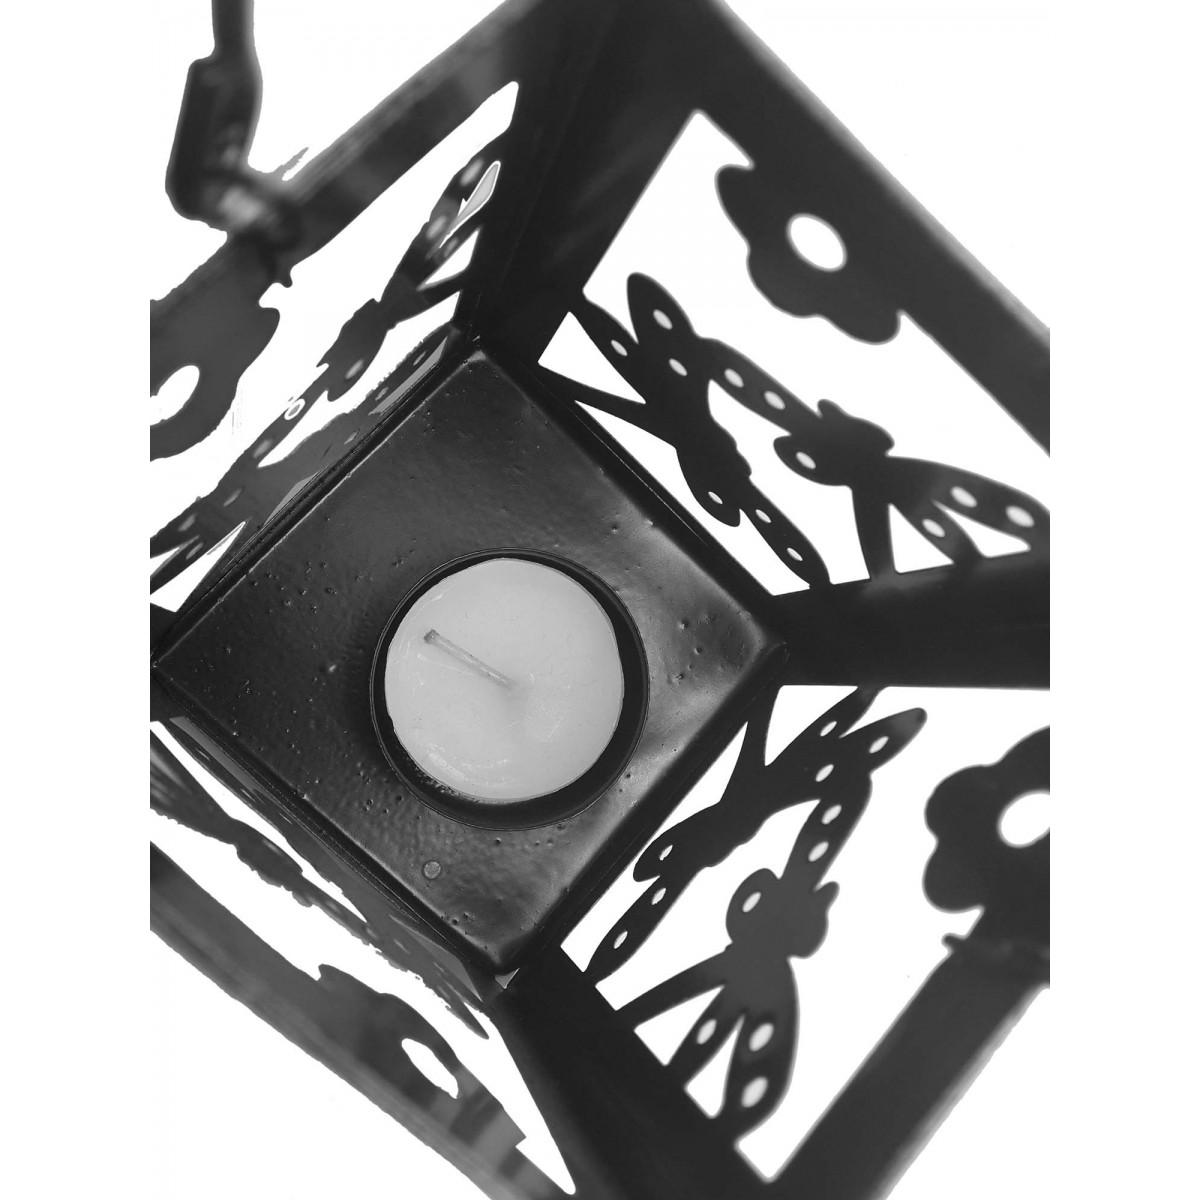 Lanterna Decorativa Porta Vela Enfeite Jardim Metal Lampiao Rosa 2 Unid (jard-75)